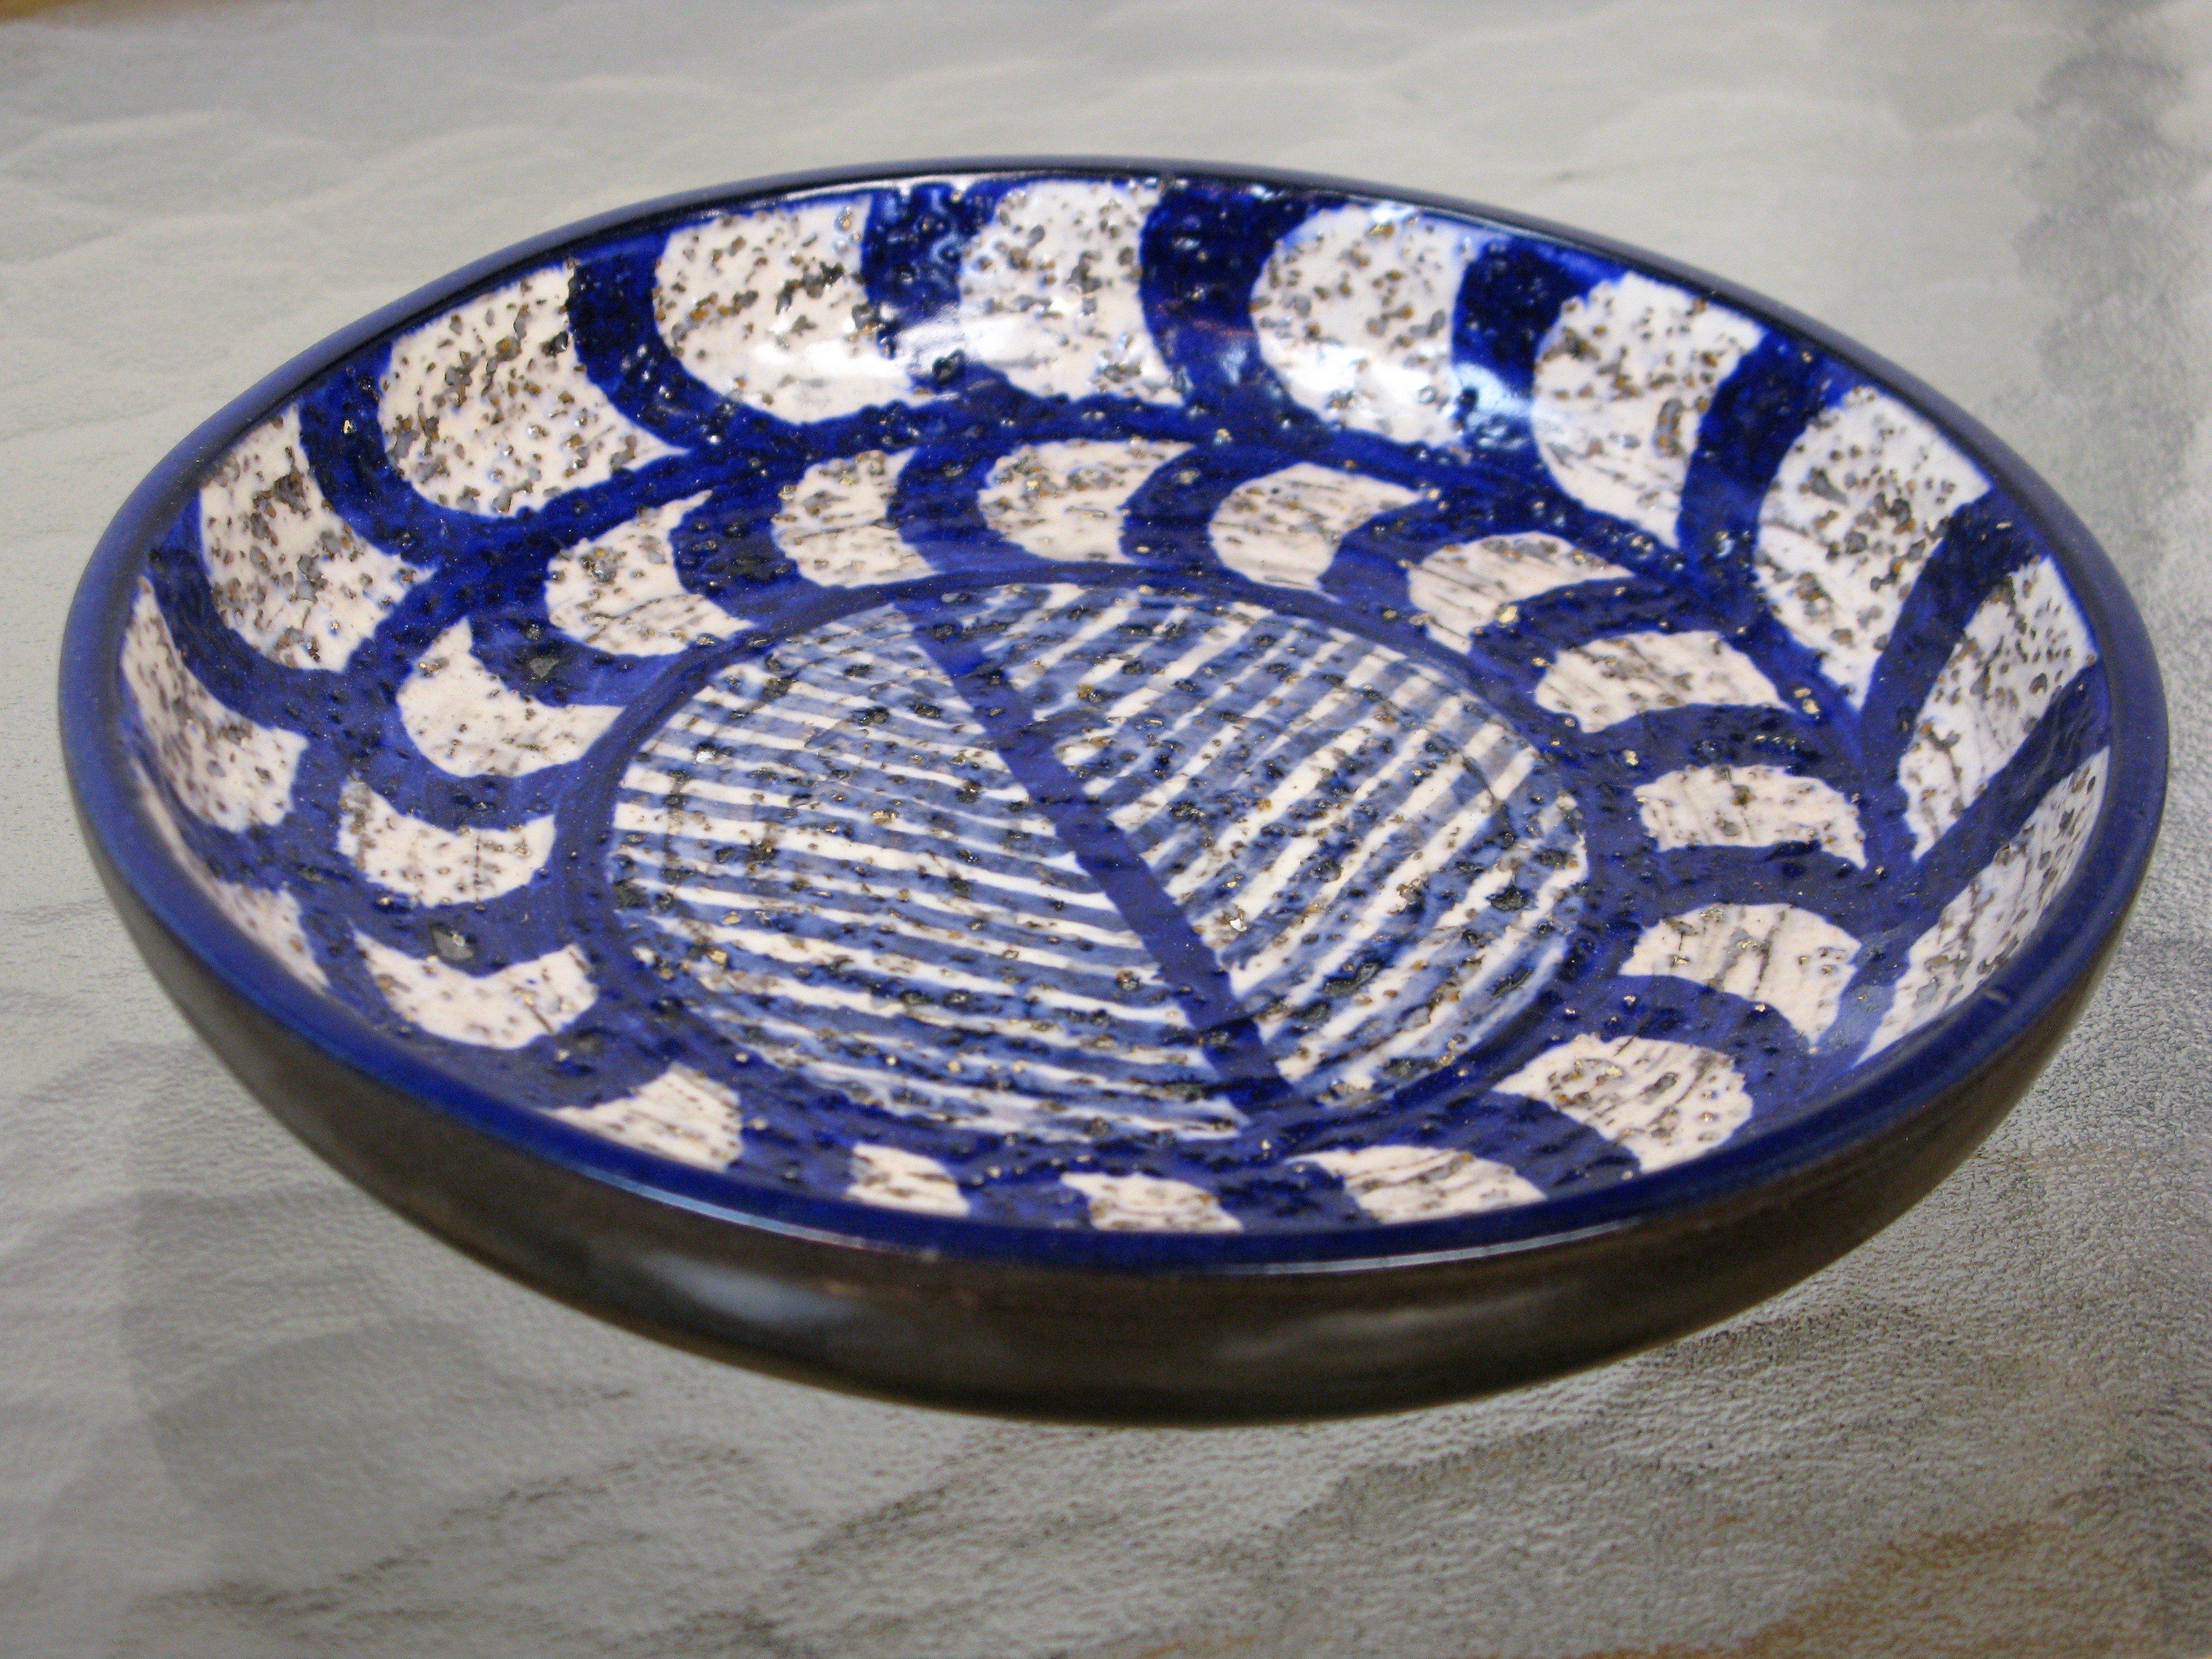 viol plate 7036m